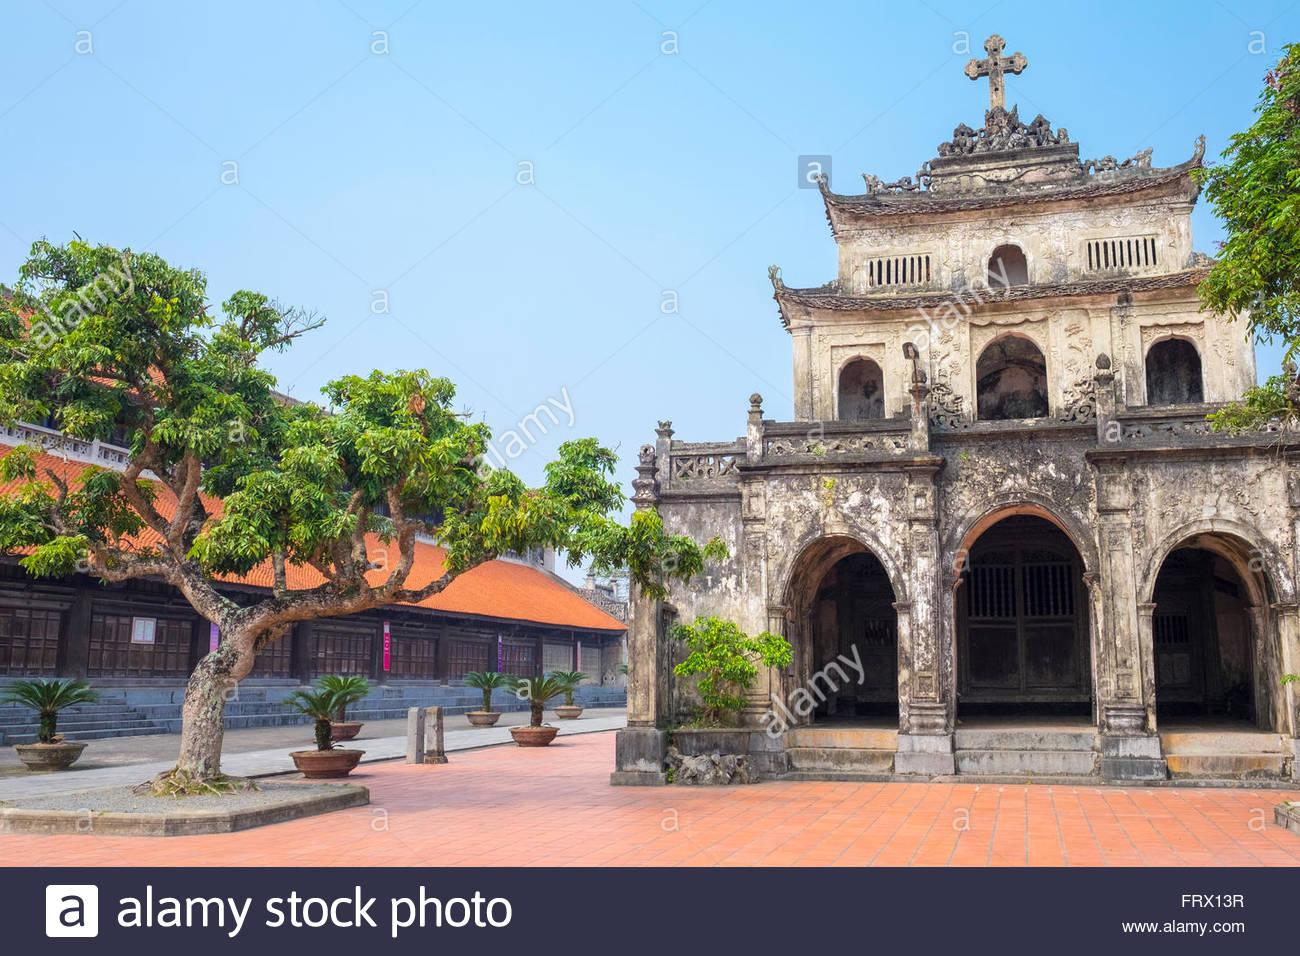 Saint Roch Chapel at Phat Diem Cathedral, Phat Diem, Ninh Binh Province, Vietnam - Stock Image